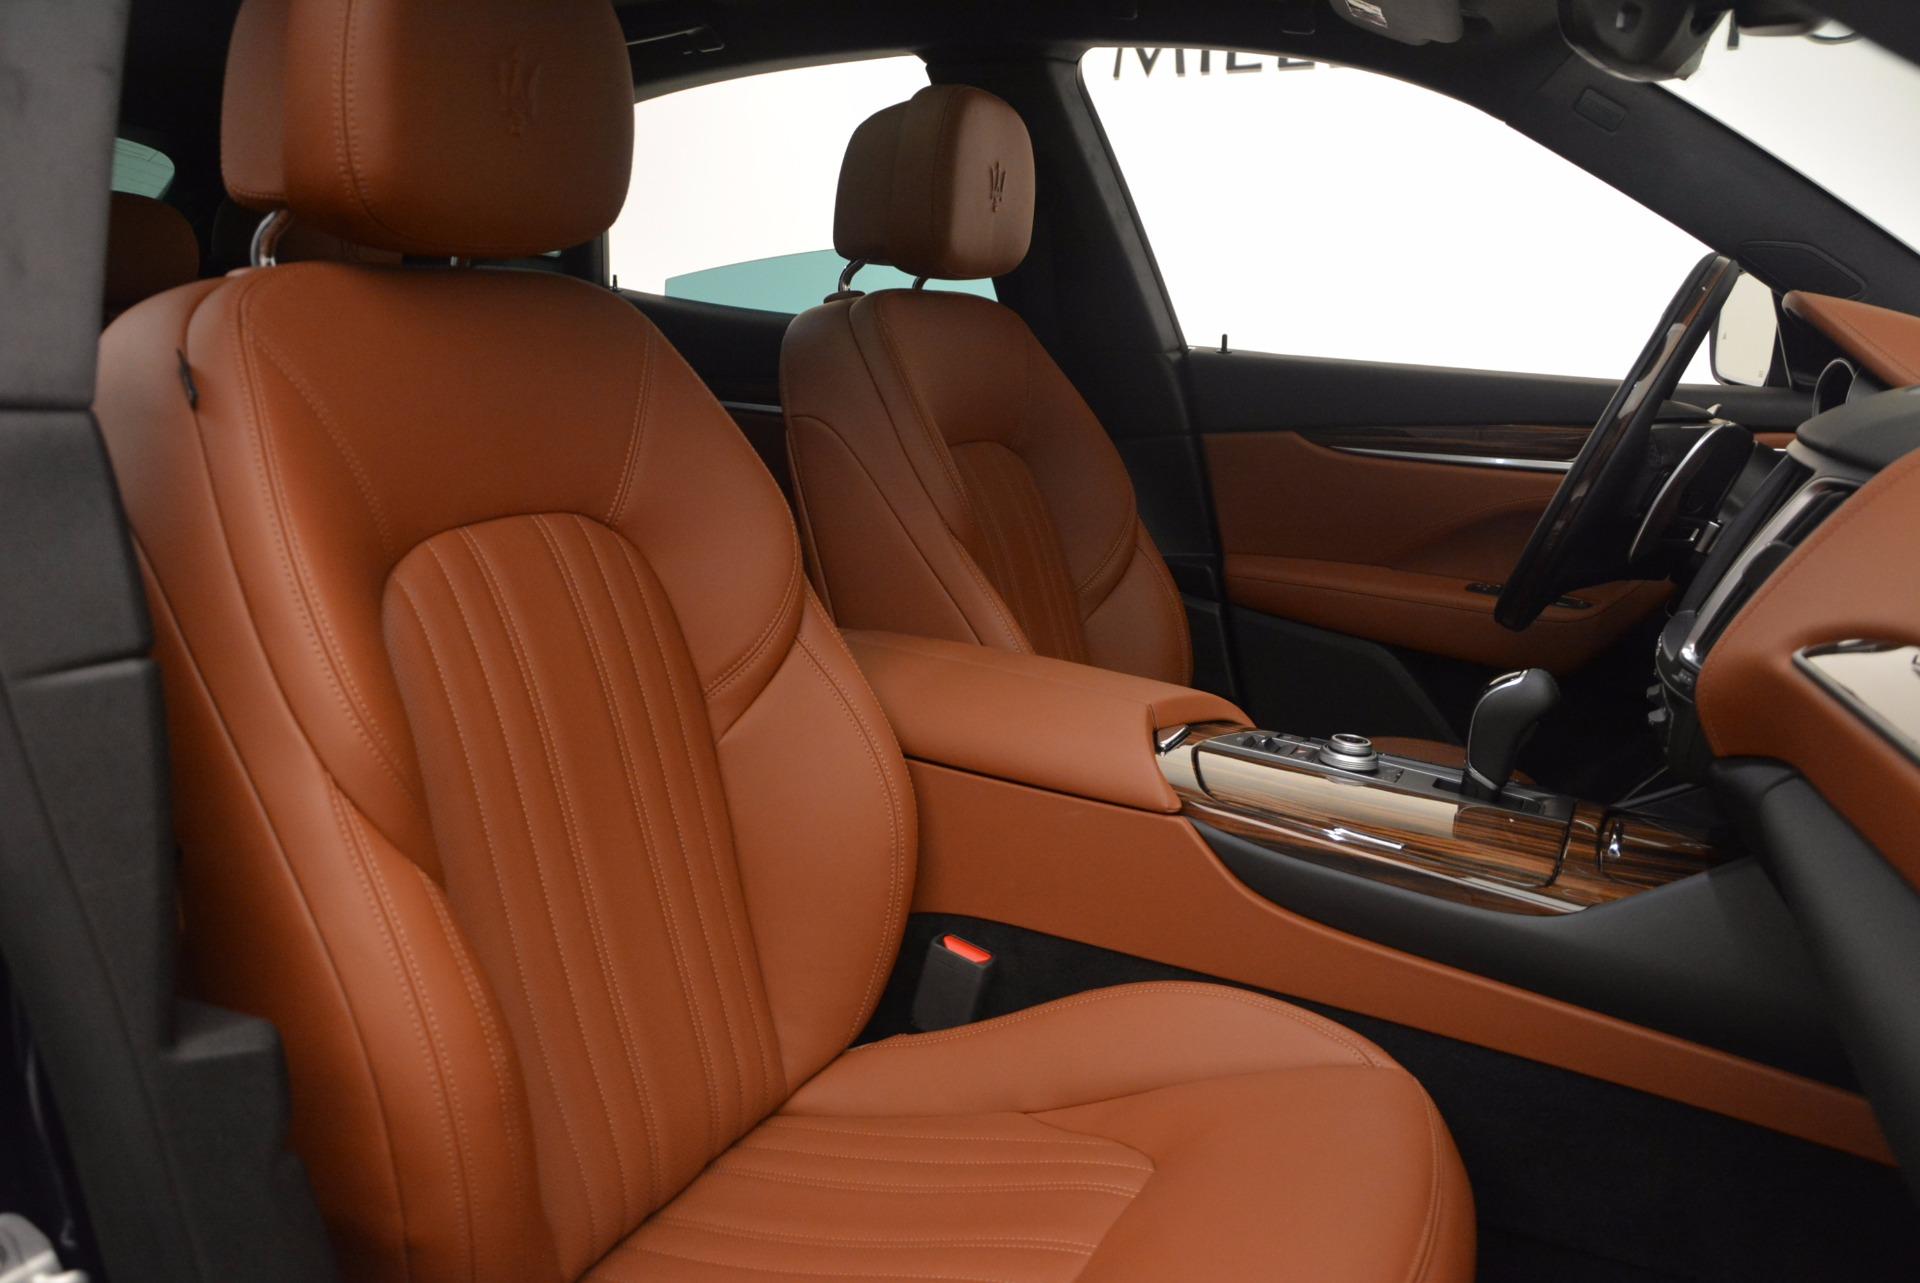 Used 2017 Maserati Levante S For Sale In Westport, CT 752_p28